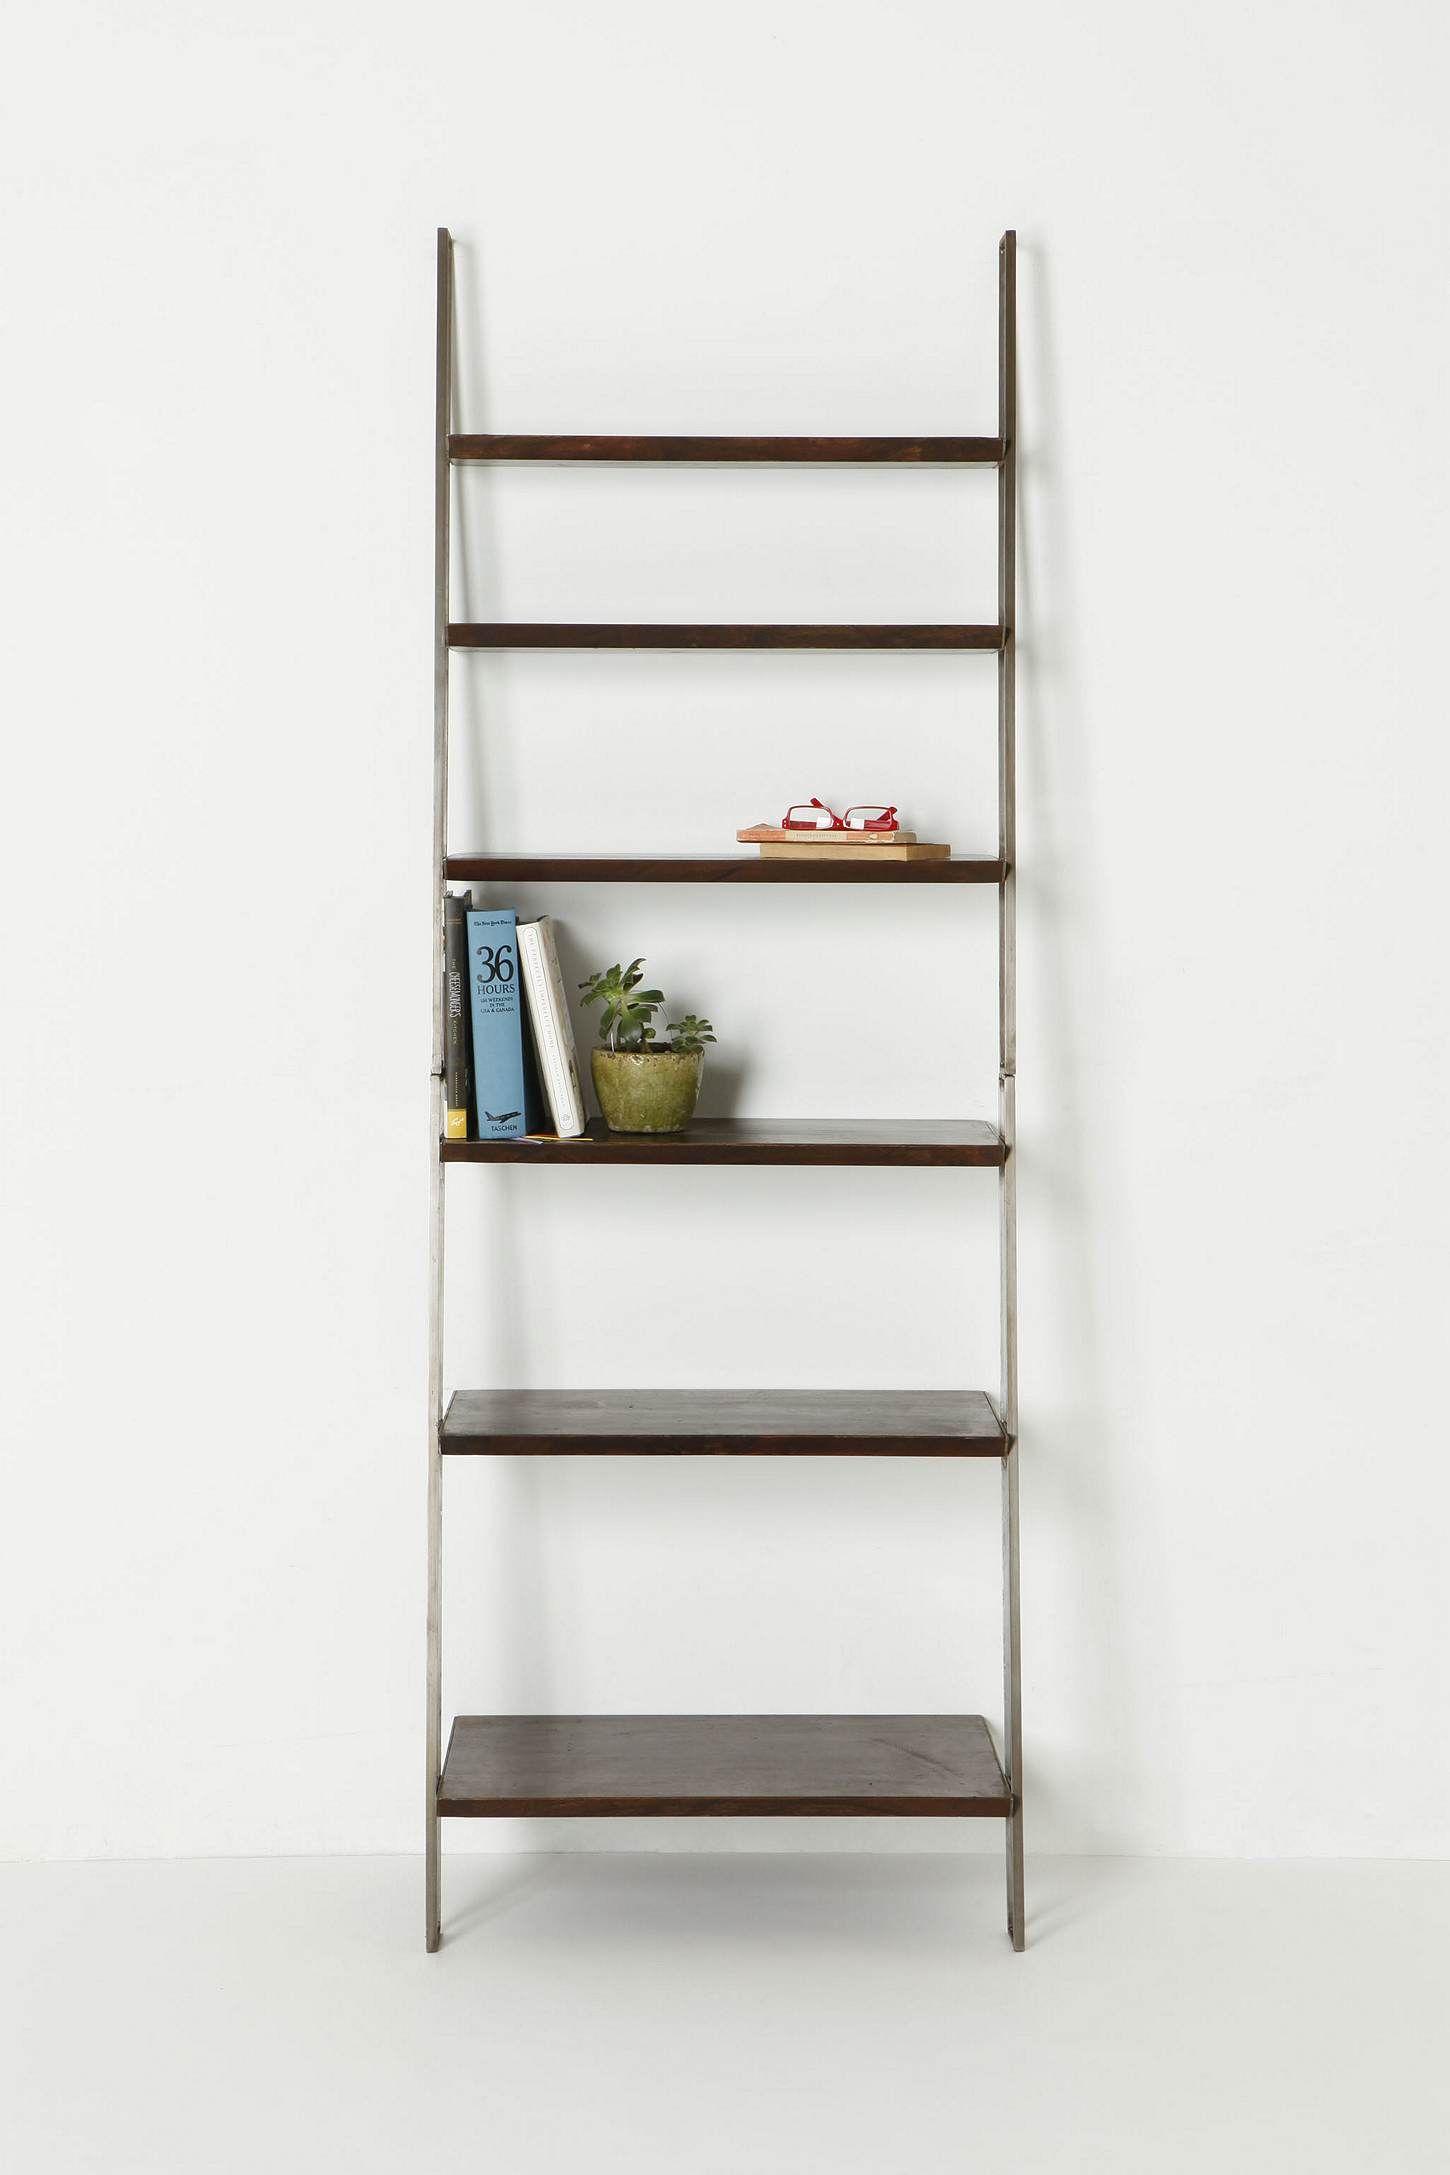 Rubied lace dress green street shelves and book shelves